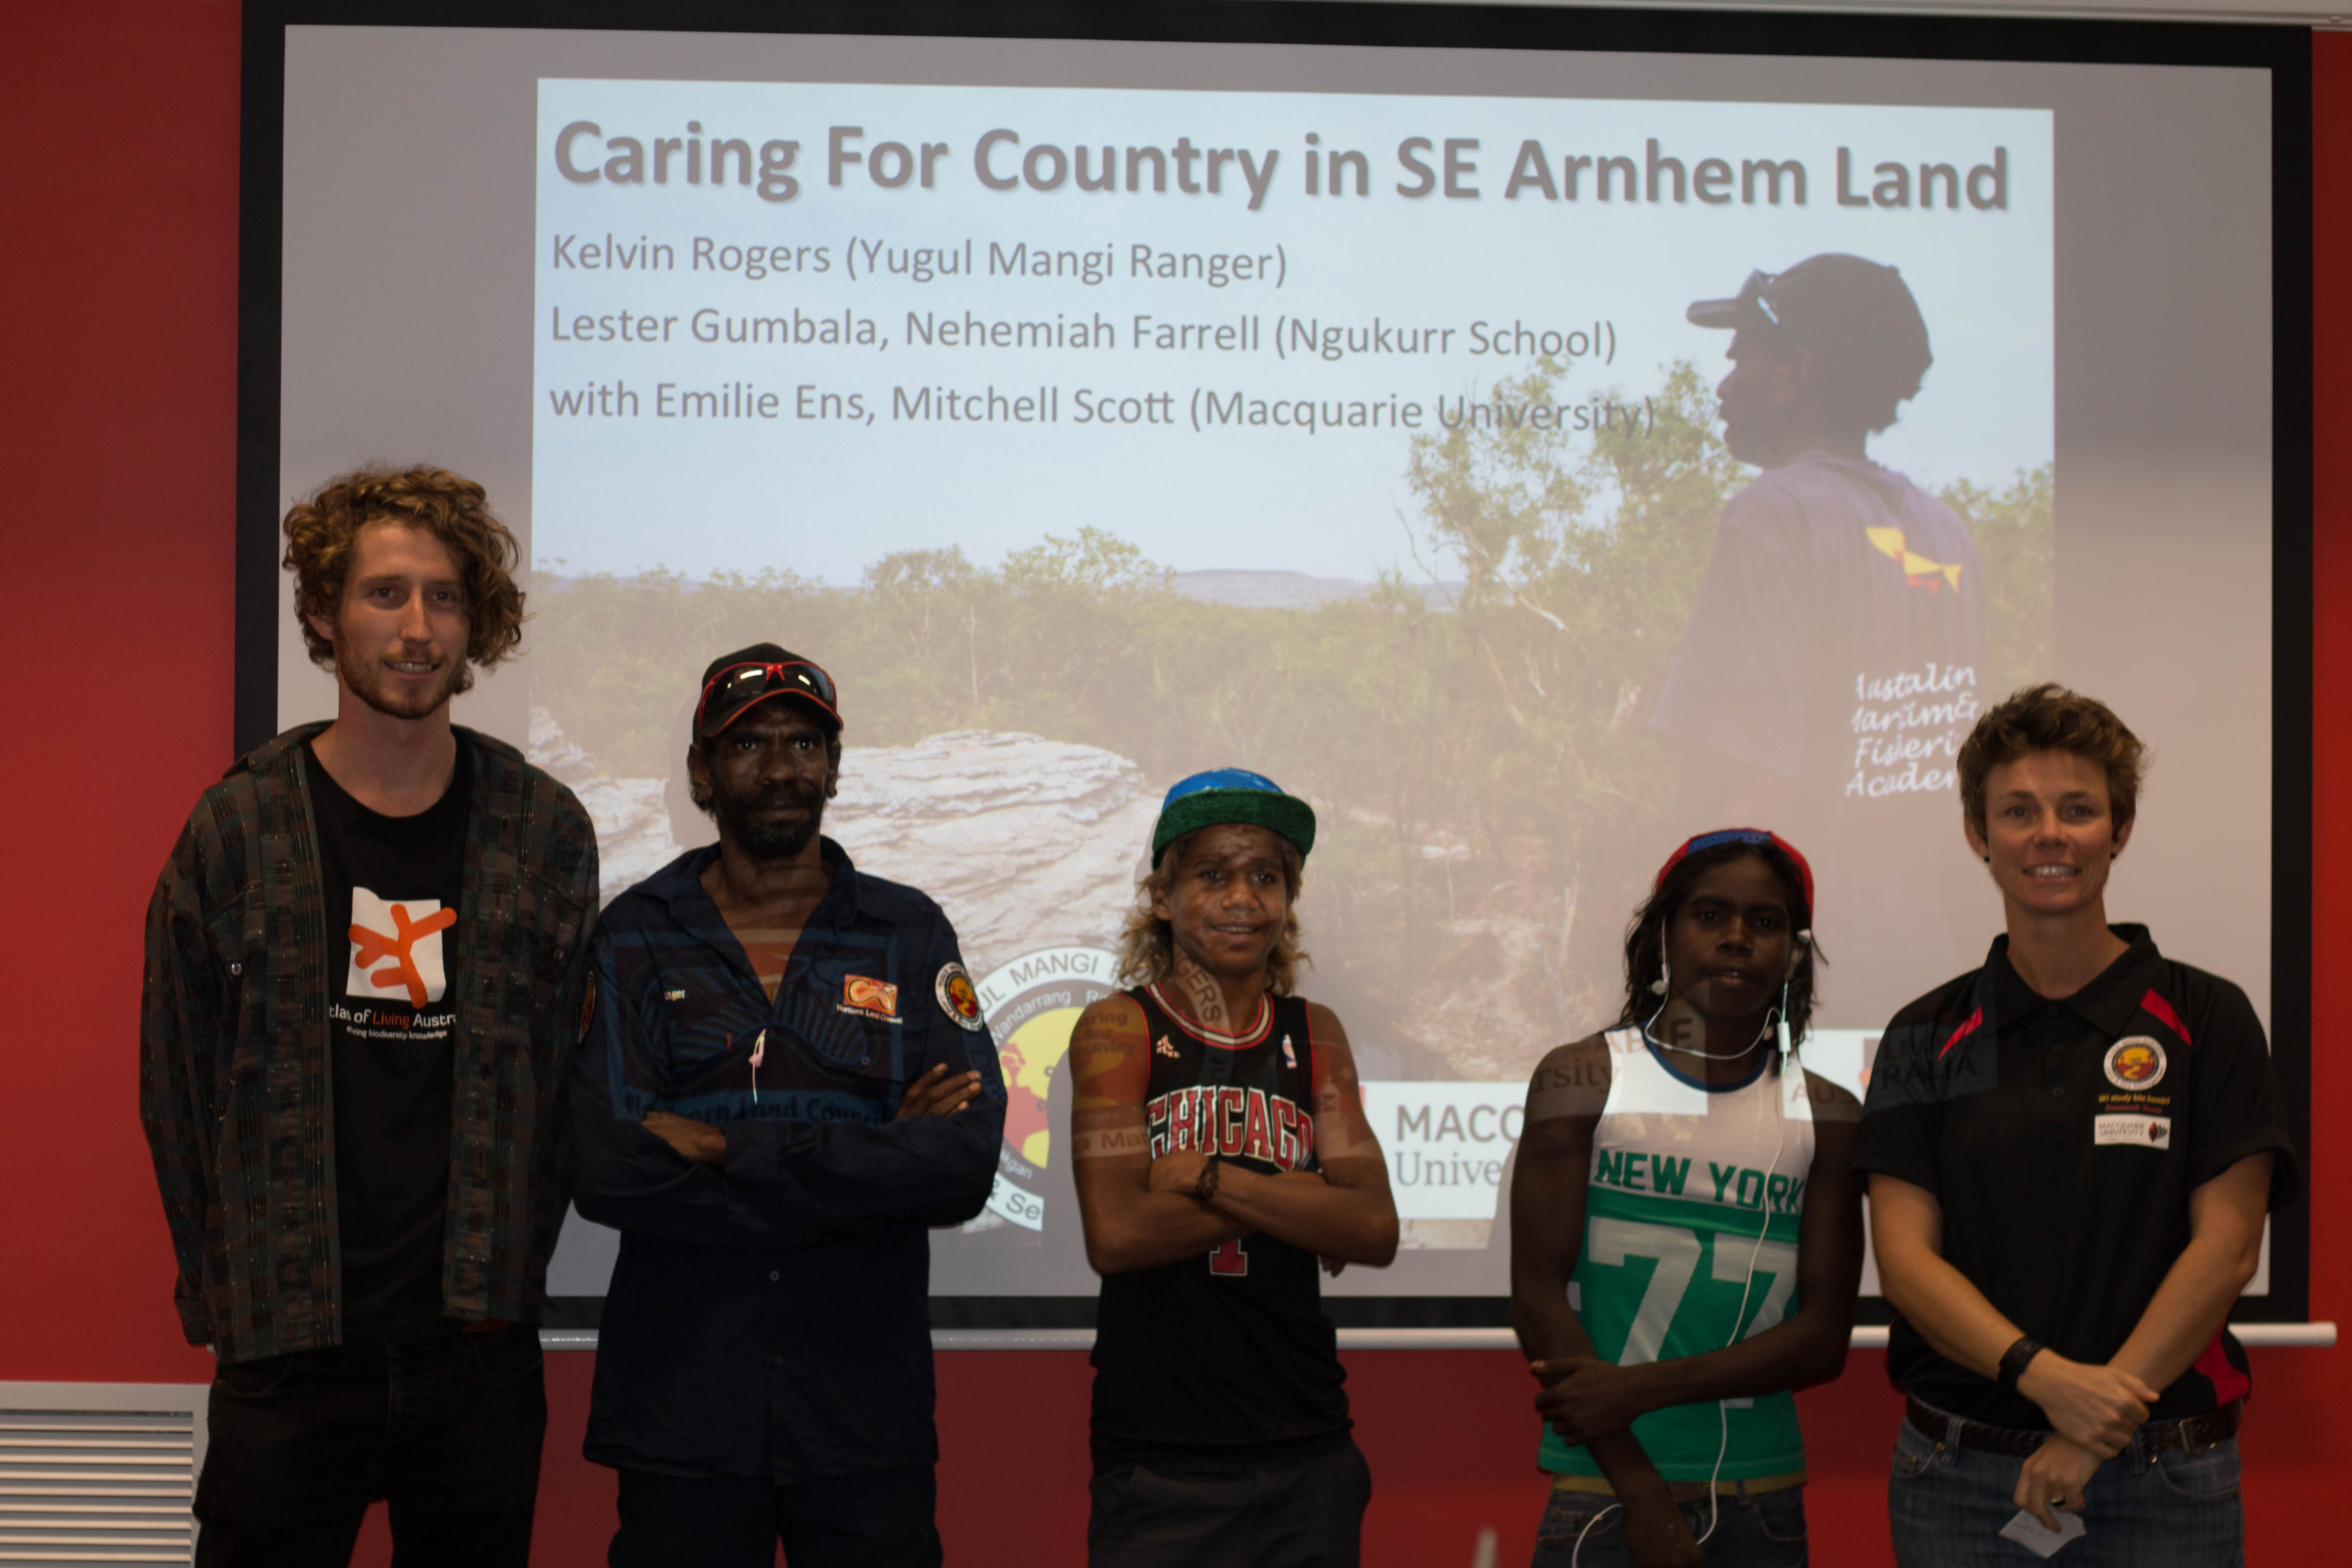 Mitchell Scott (Macquarie University), Kelvin Rogers (Yugul Mangi Ranger), Nehemiah Farrell (Ngukurr School Student), Lester Gumbula (Ngukurr School Student) and Emilie Ens (Macquarie University)